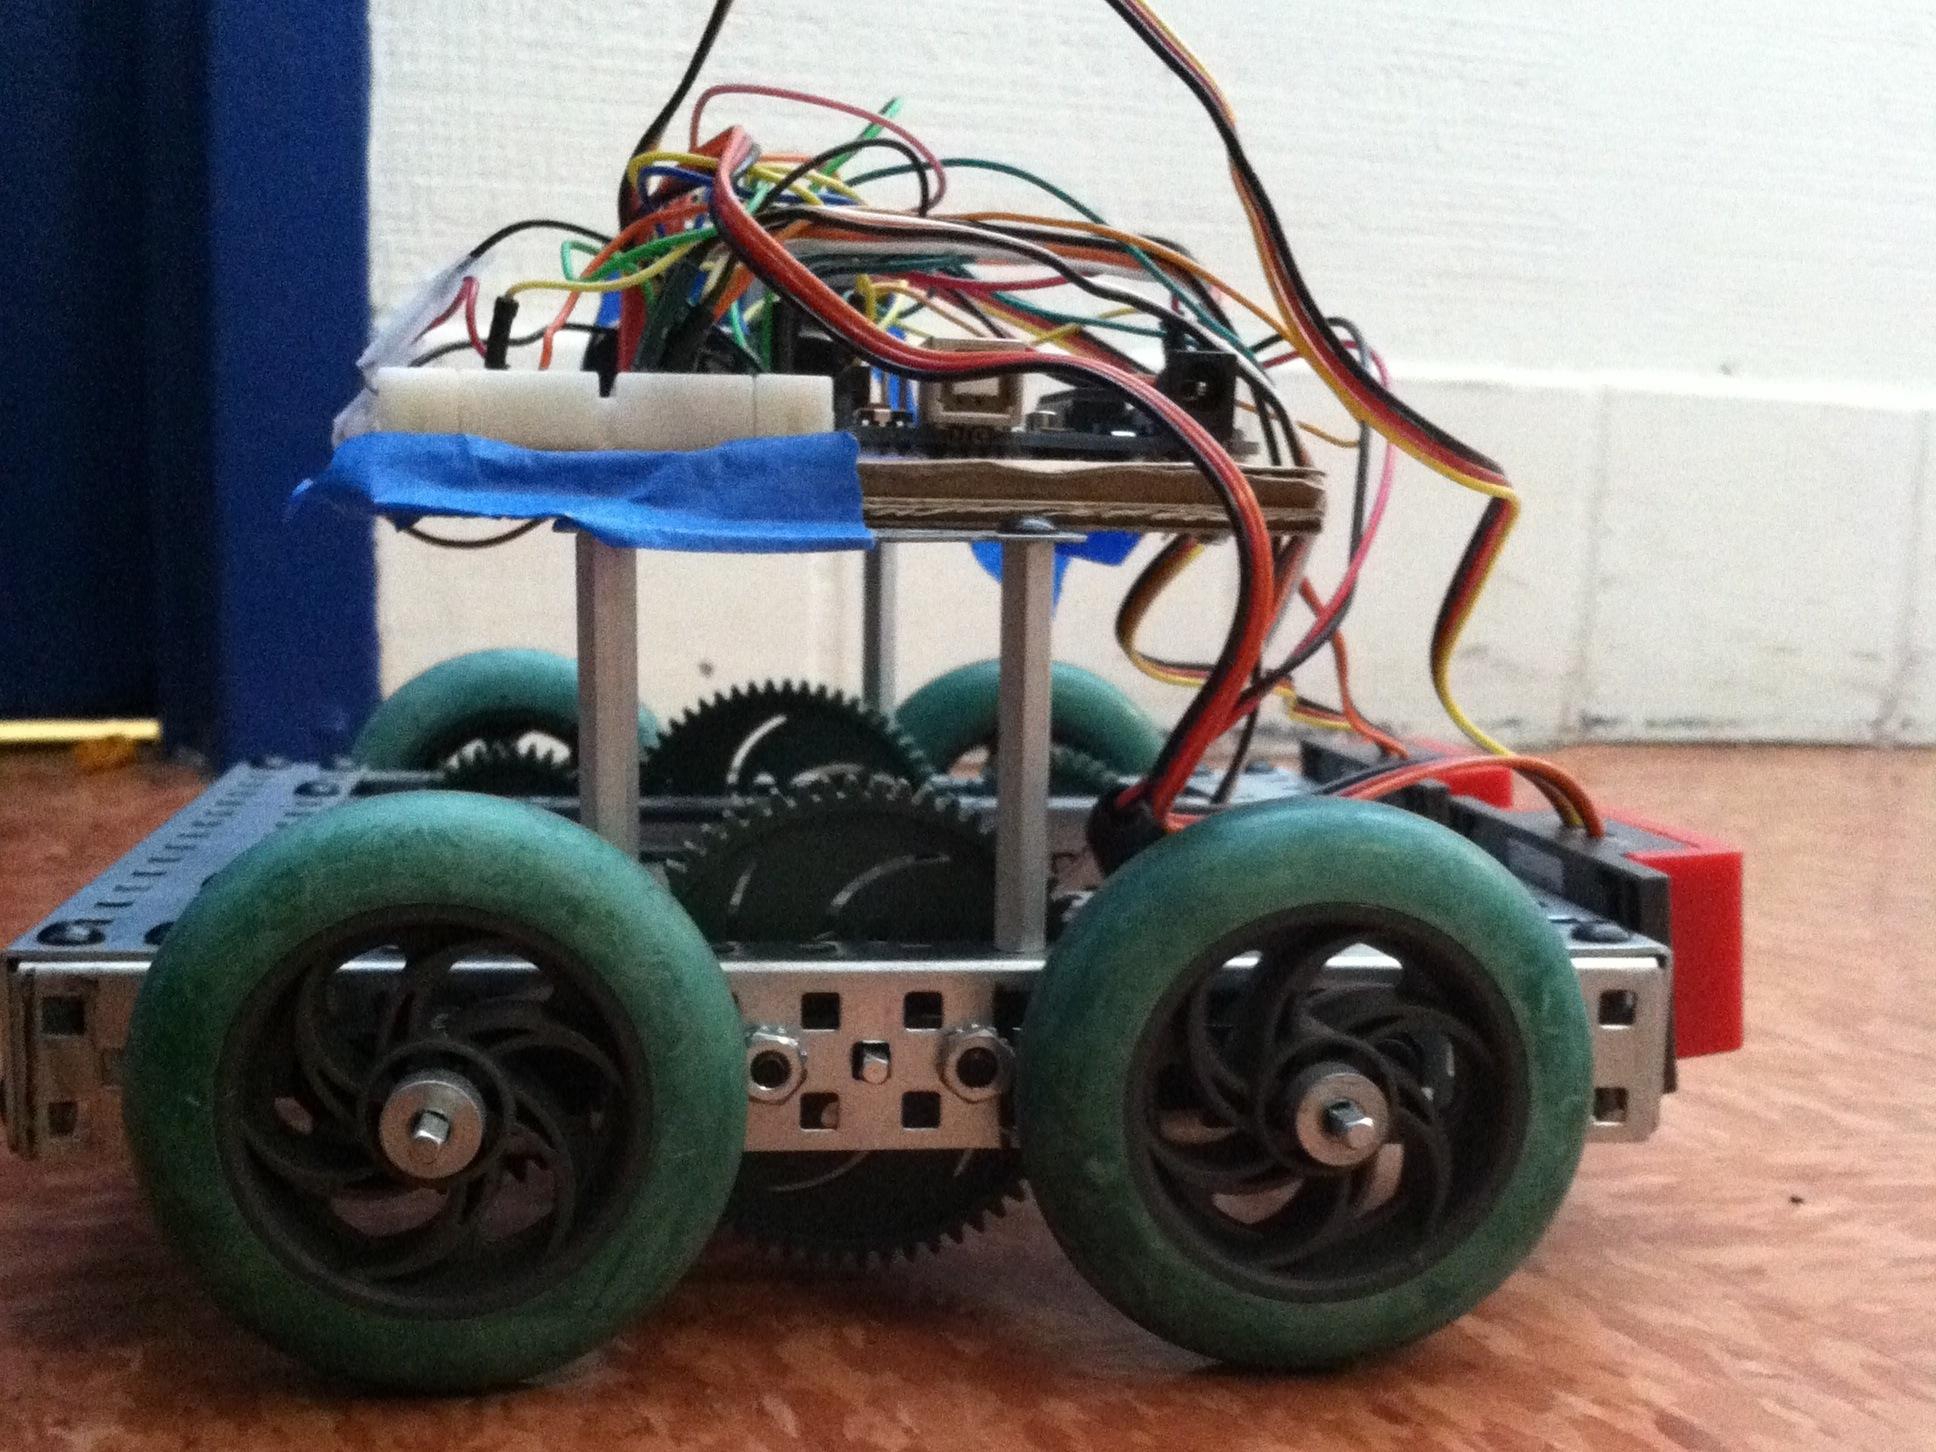 The Stalker 'Bot